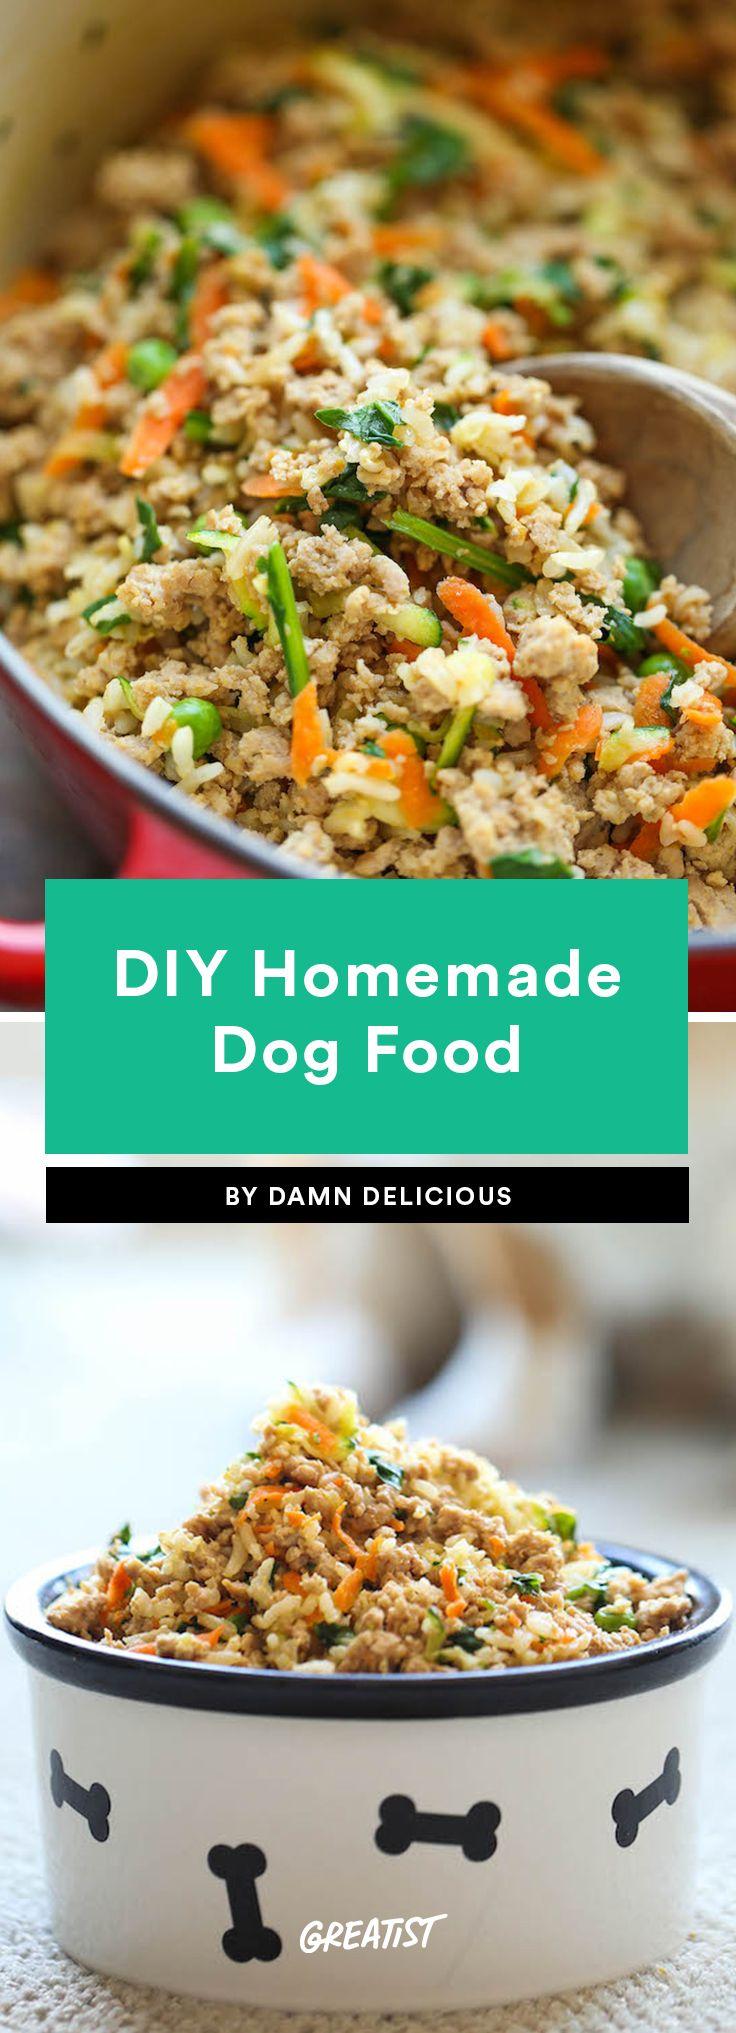 7 homemade dog food recipes we wont tell anyone you ate